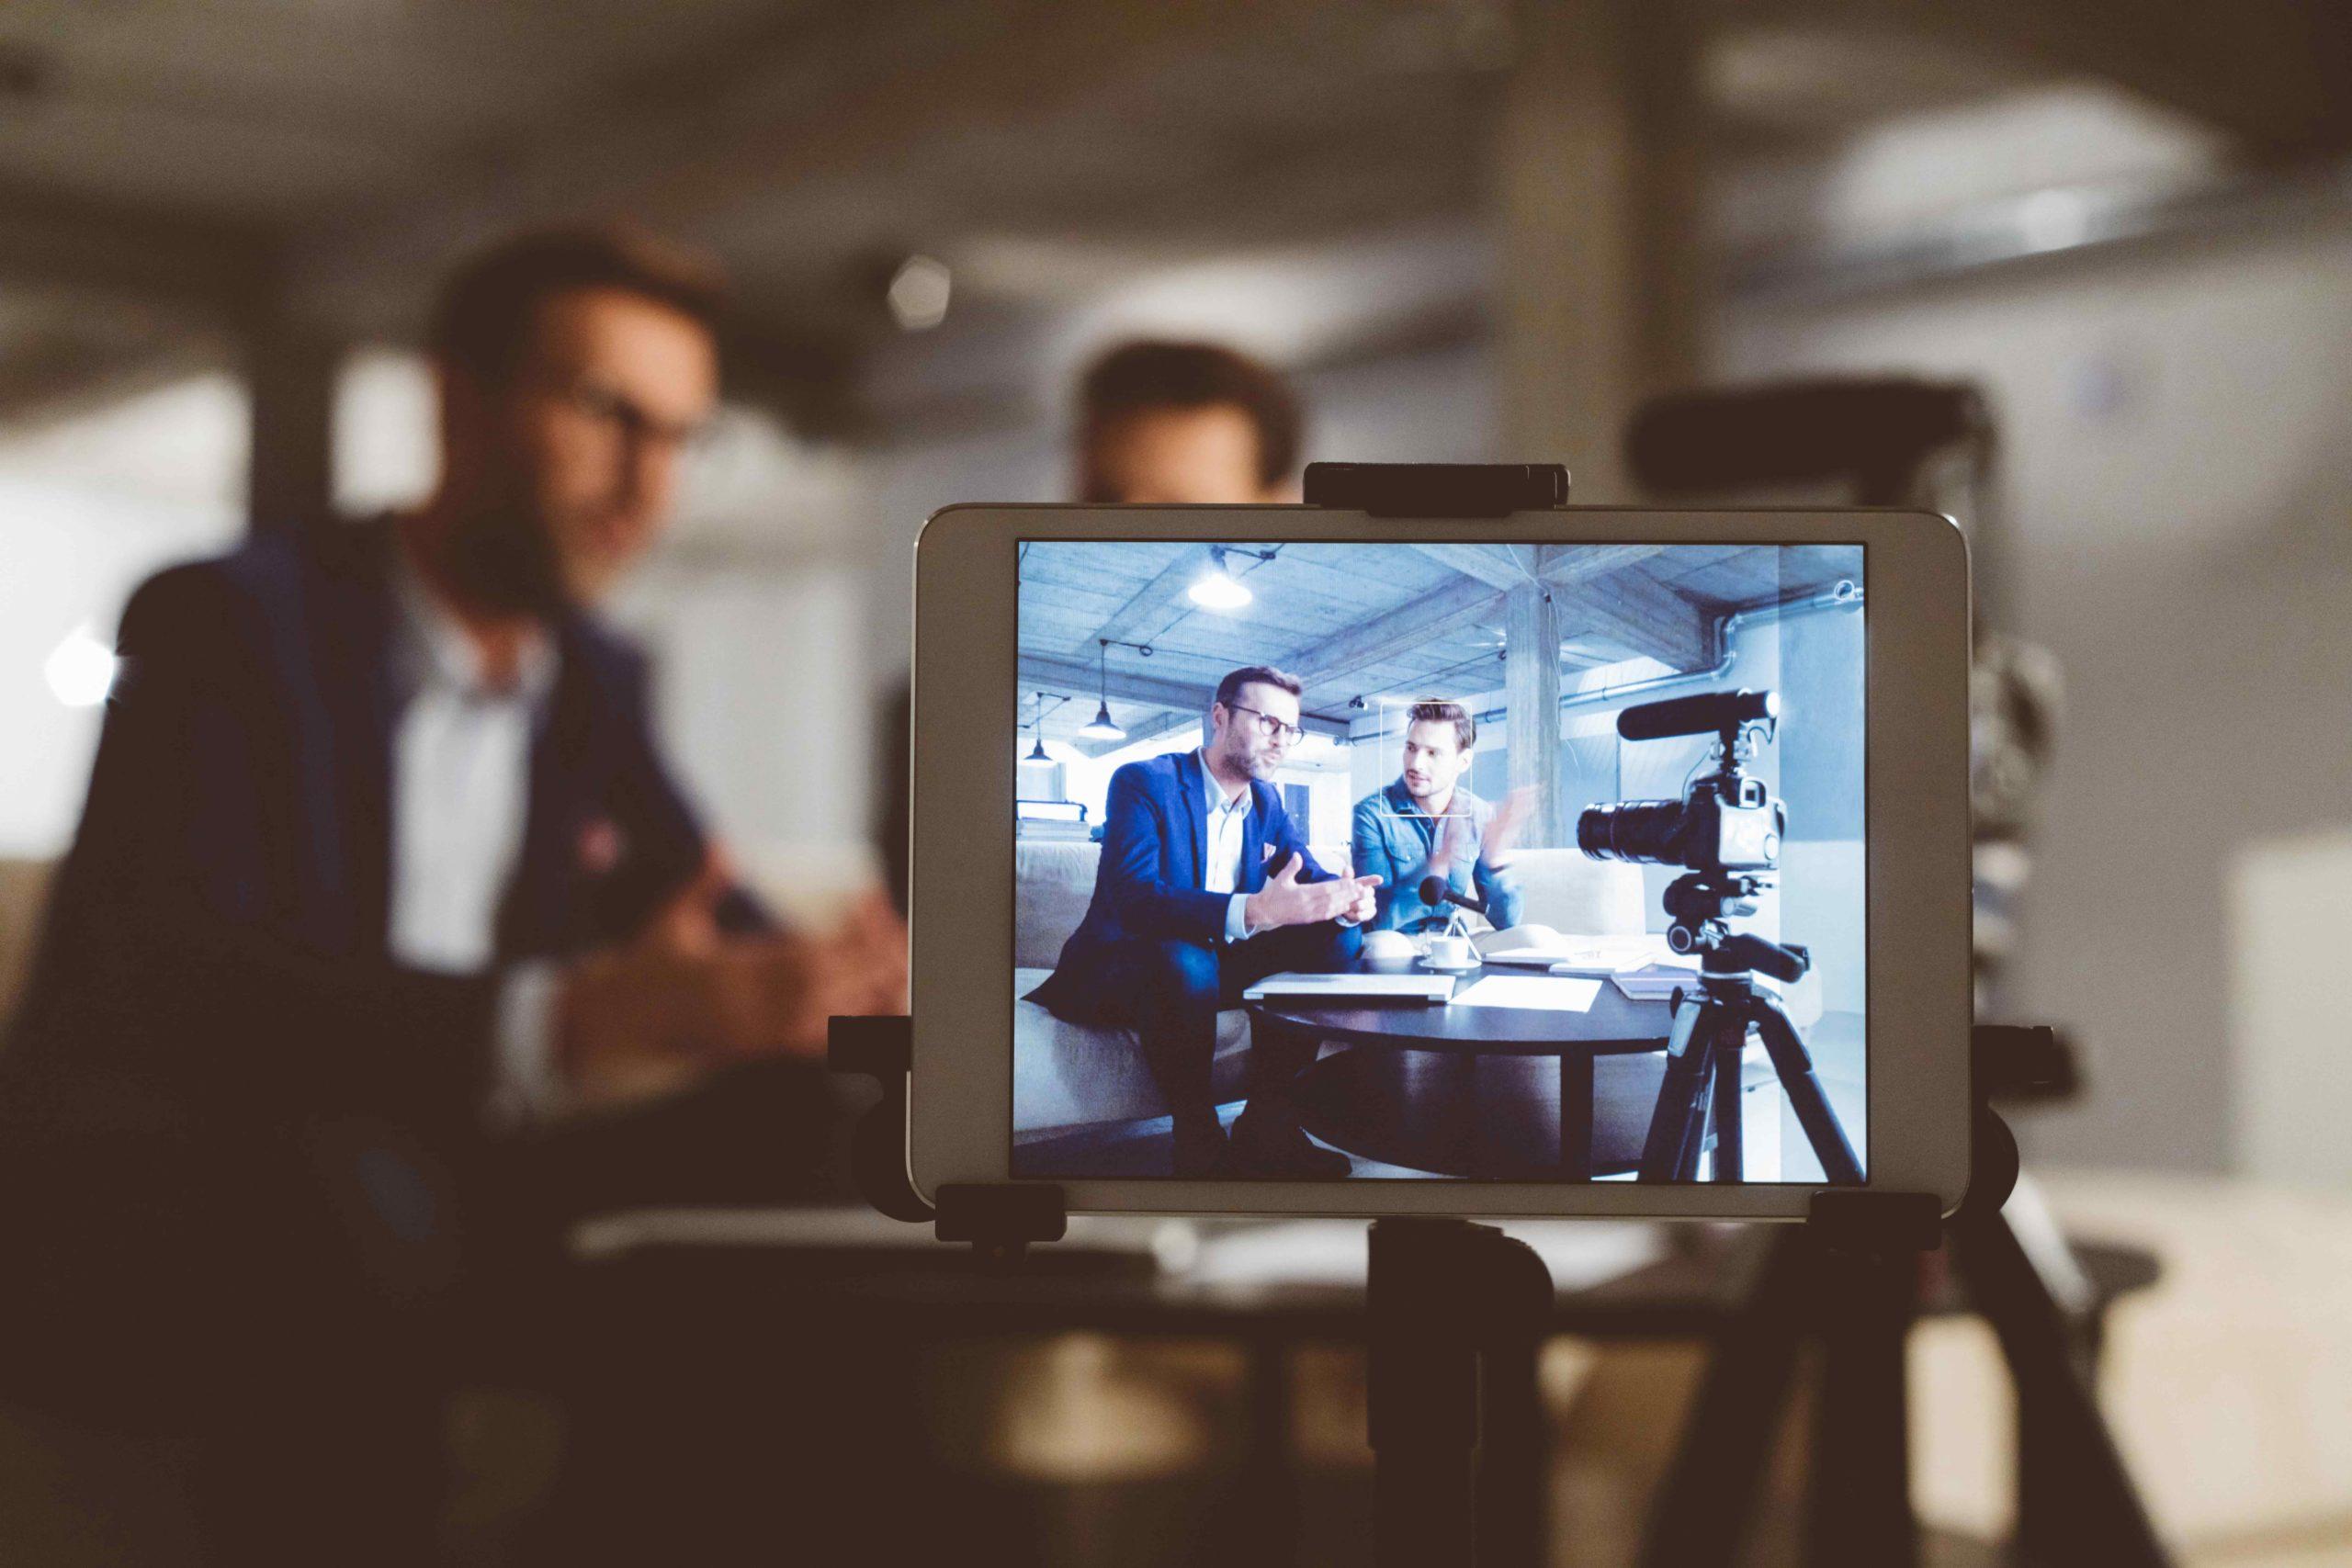 ikadia-blog-marketing-video-strategie-communication-digitale1